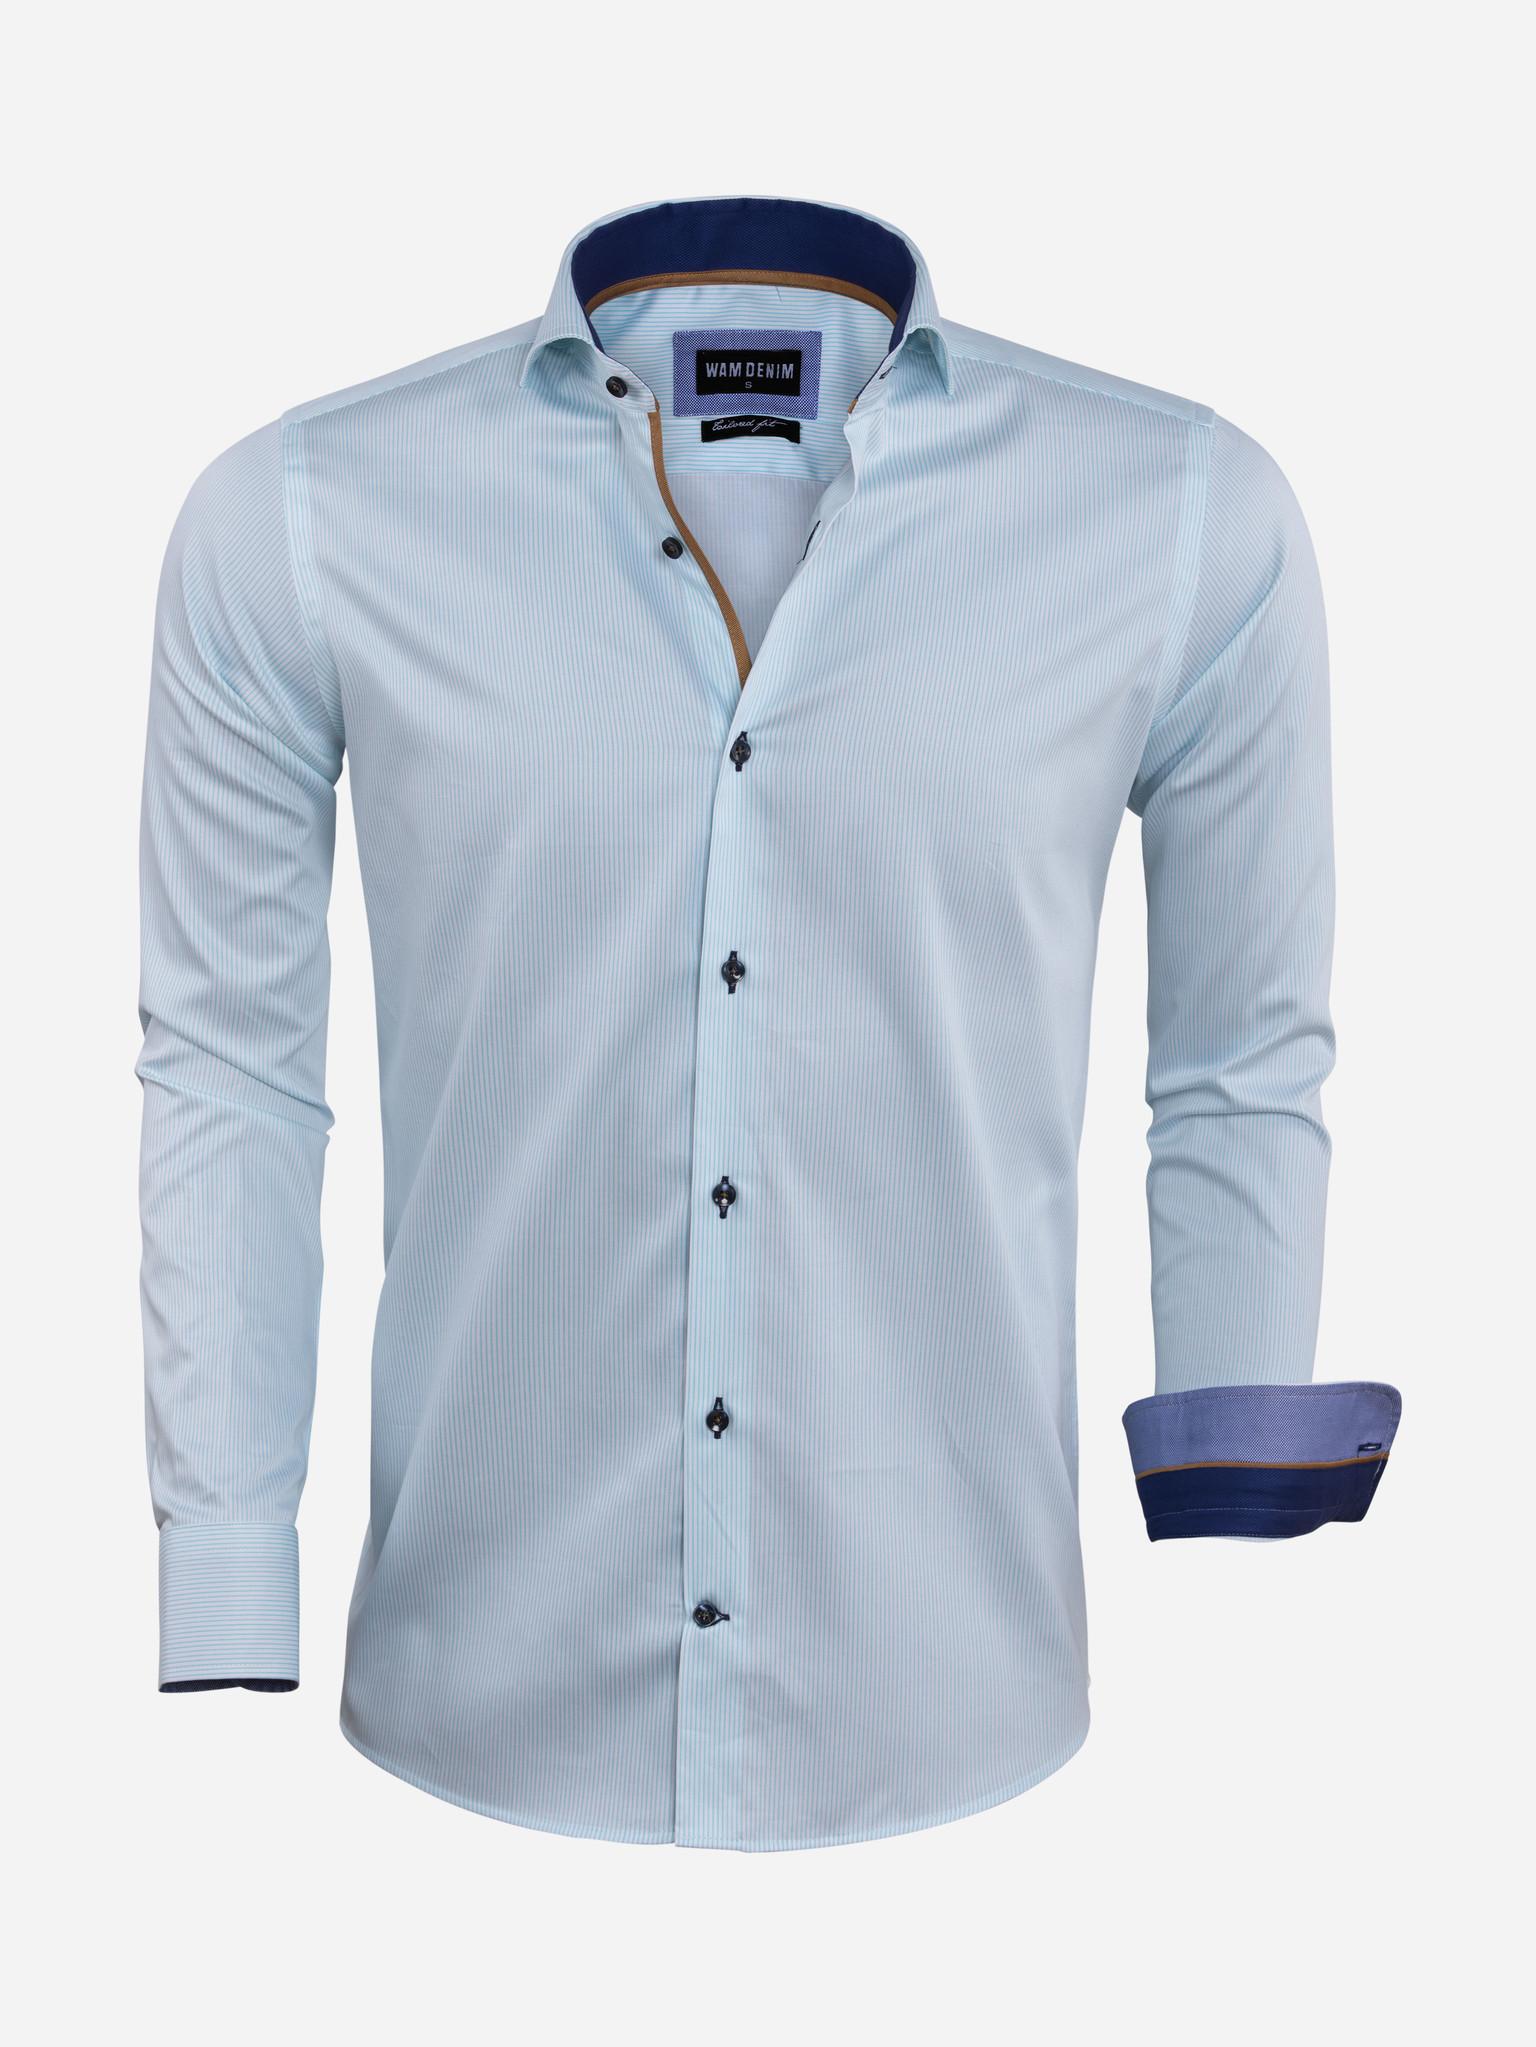 Wam Denim Overhemd Lange Mouw  Maat: 3XL